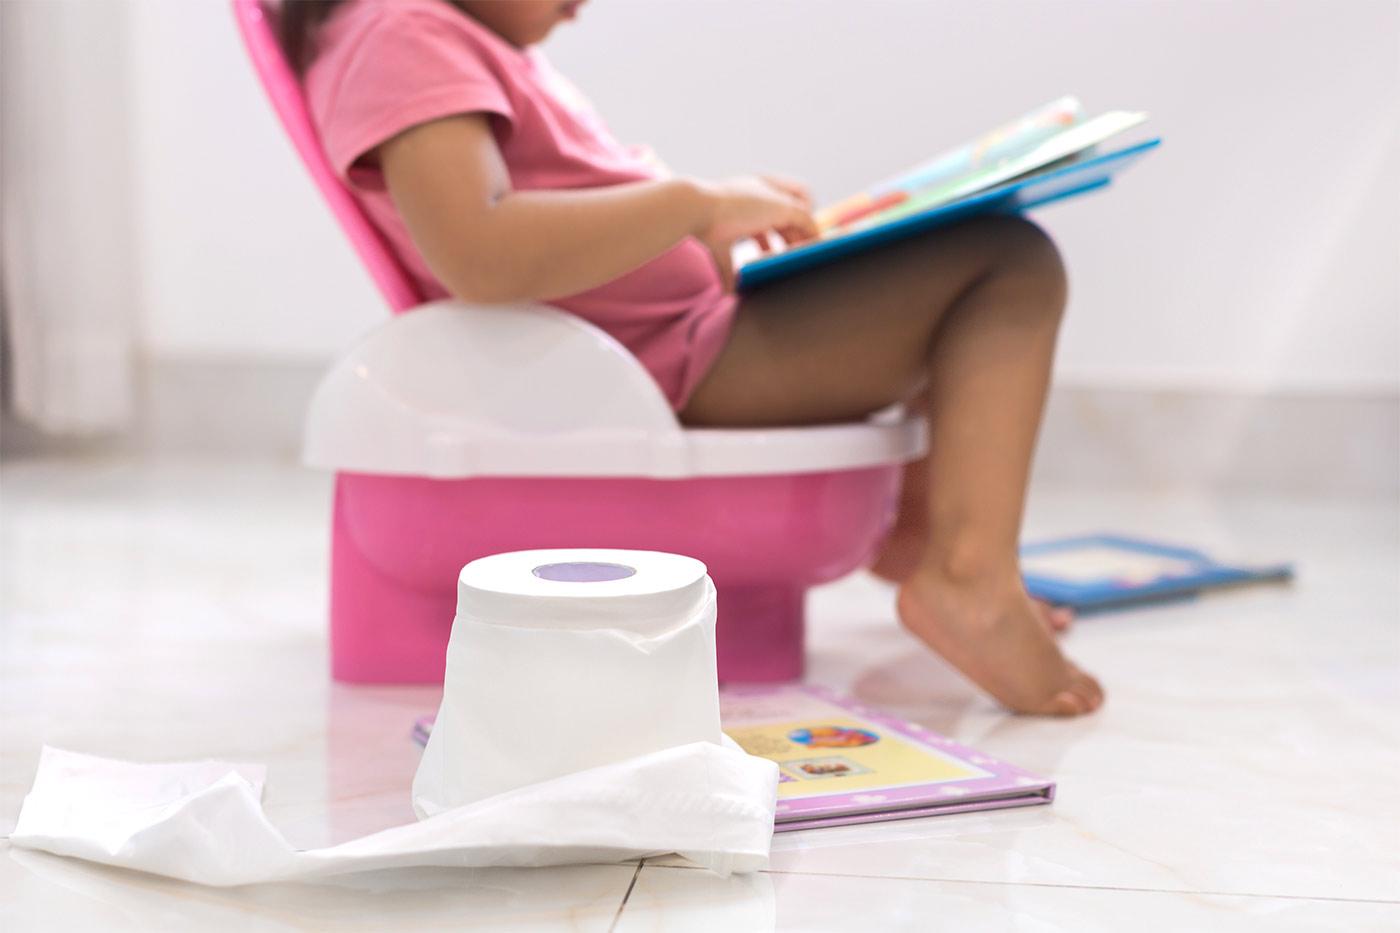 toddler won't poop on potty